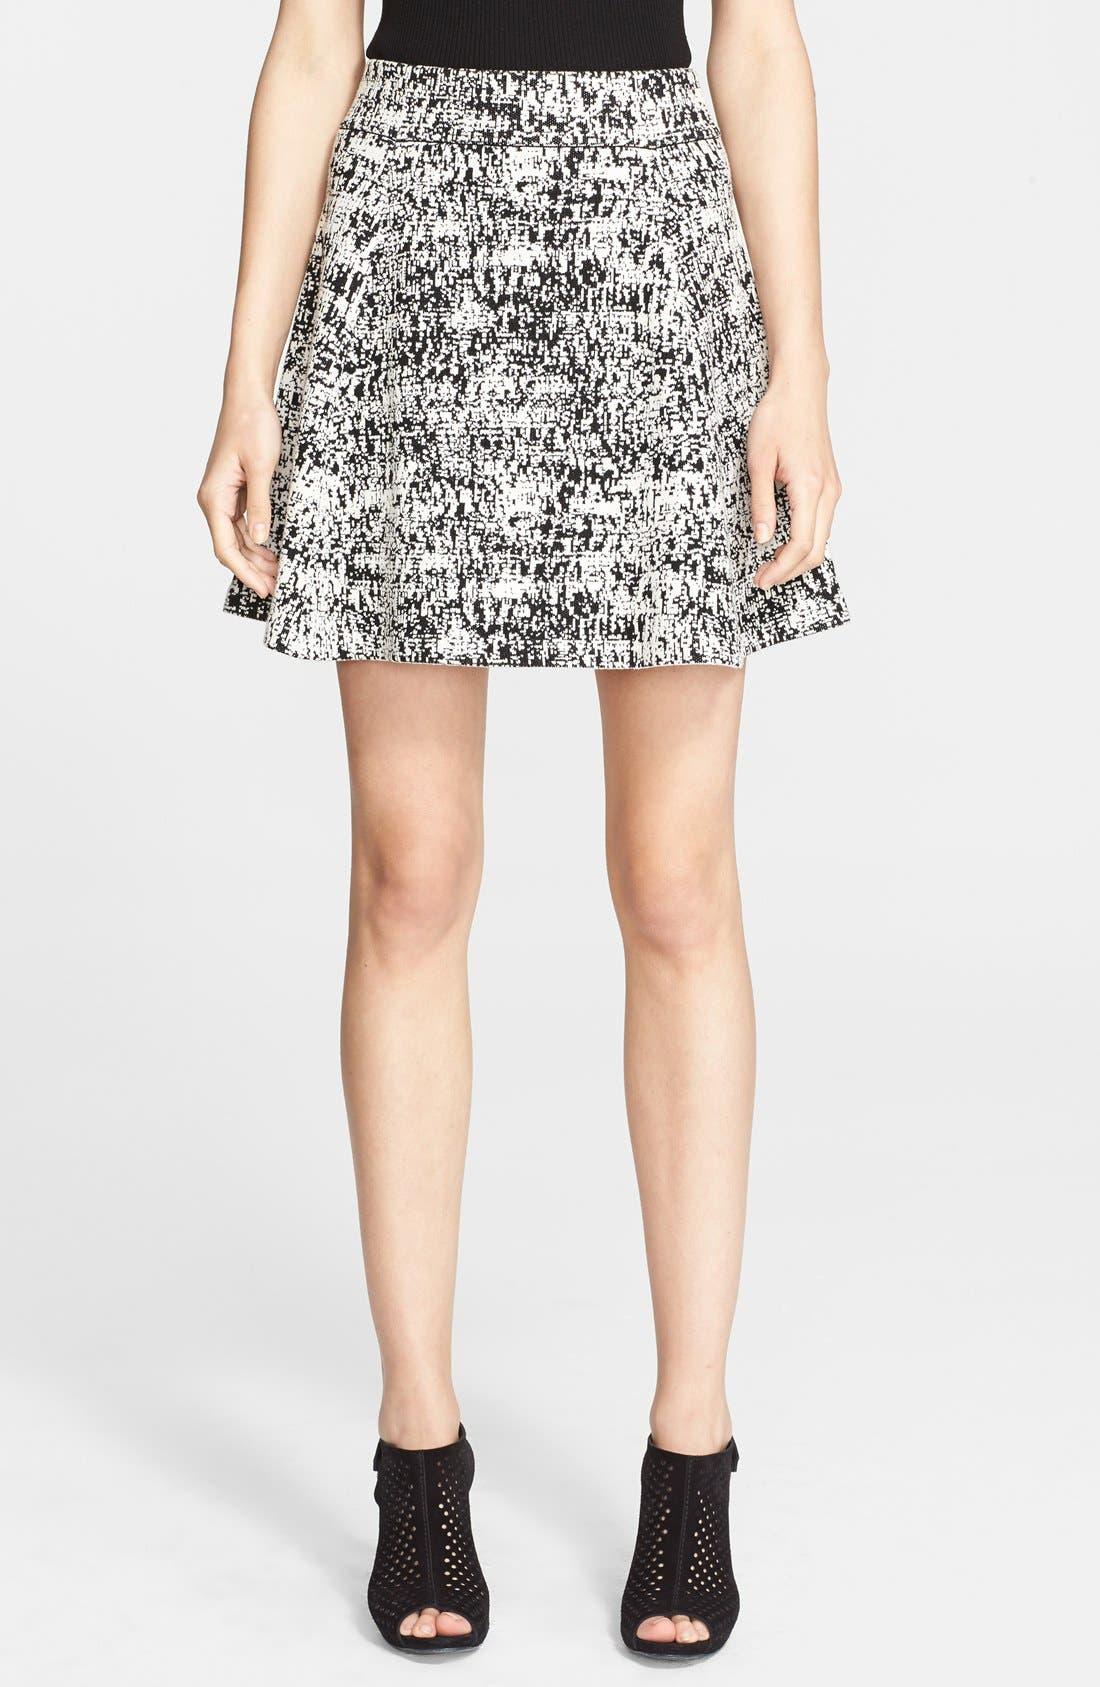 Main Image - Theory 'Doreene Tweedscape' Print Woven Skirt